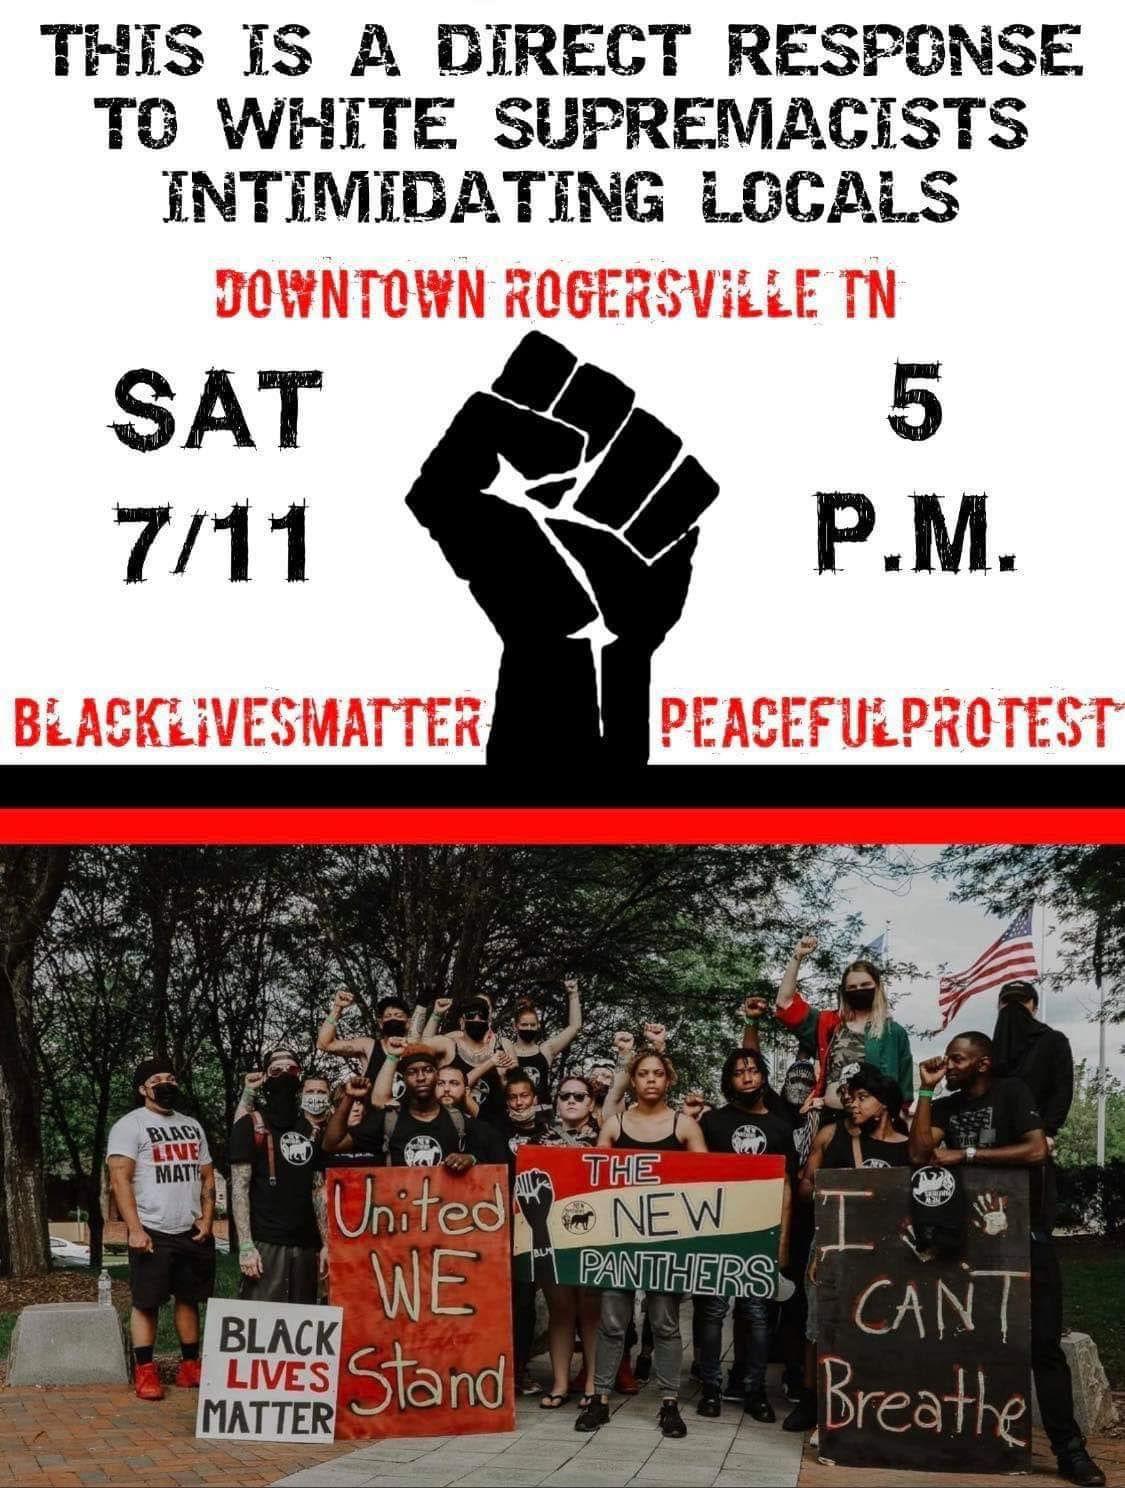 Town of Rogersville releases statement regarding Saturday's scheduled protest